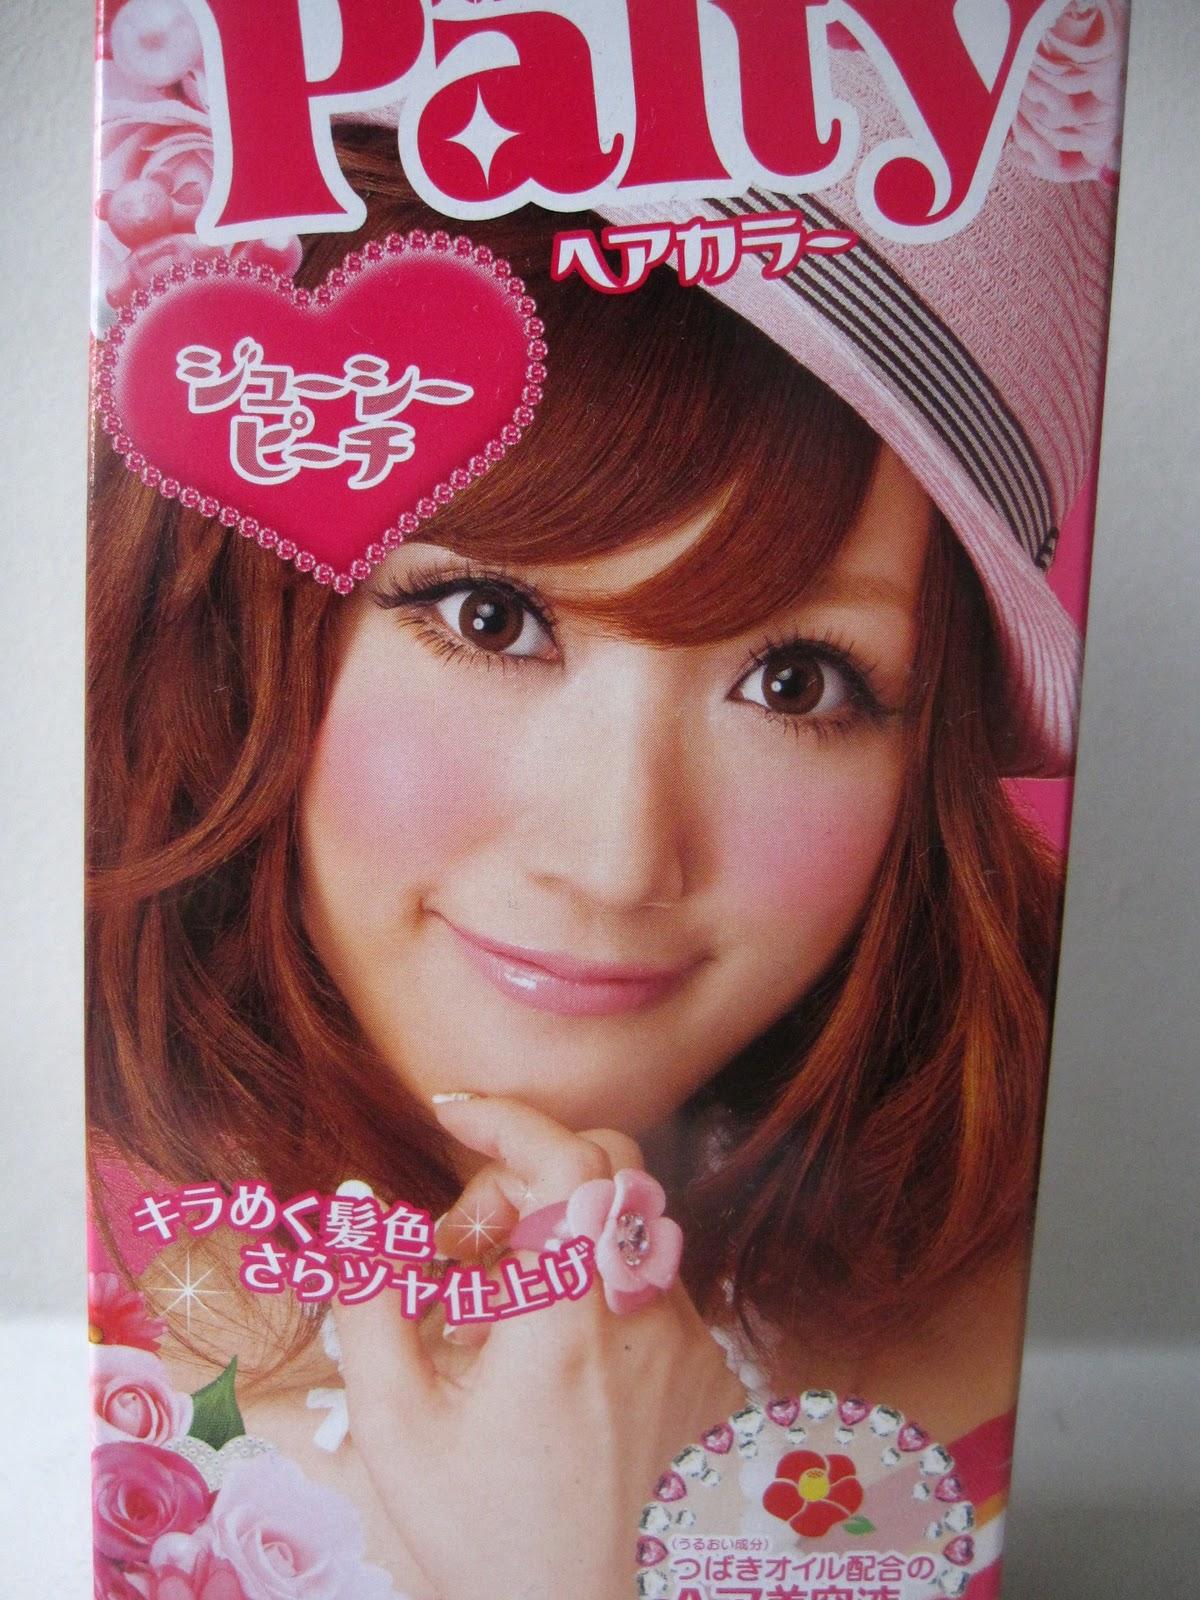 Palty Hair Color Japan Palty Girl Hair Colour Juicy Peach